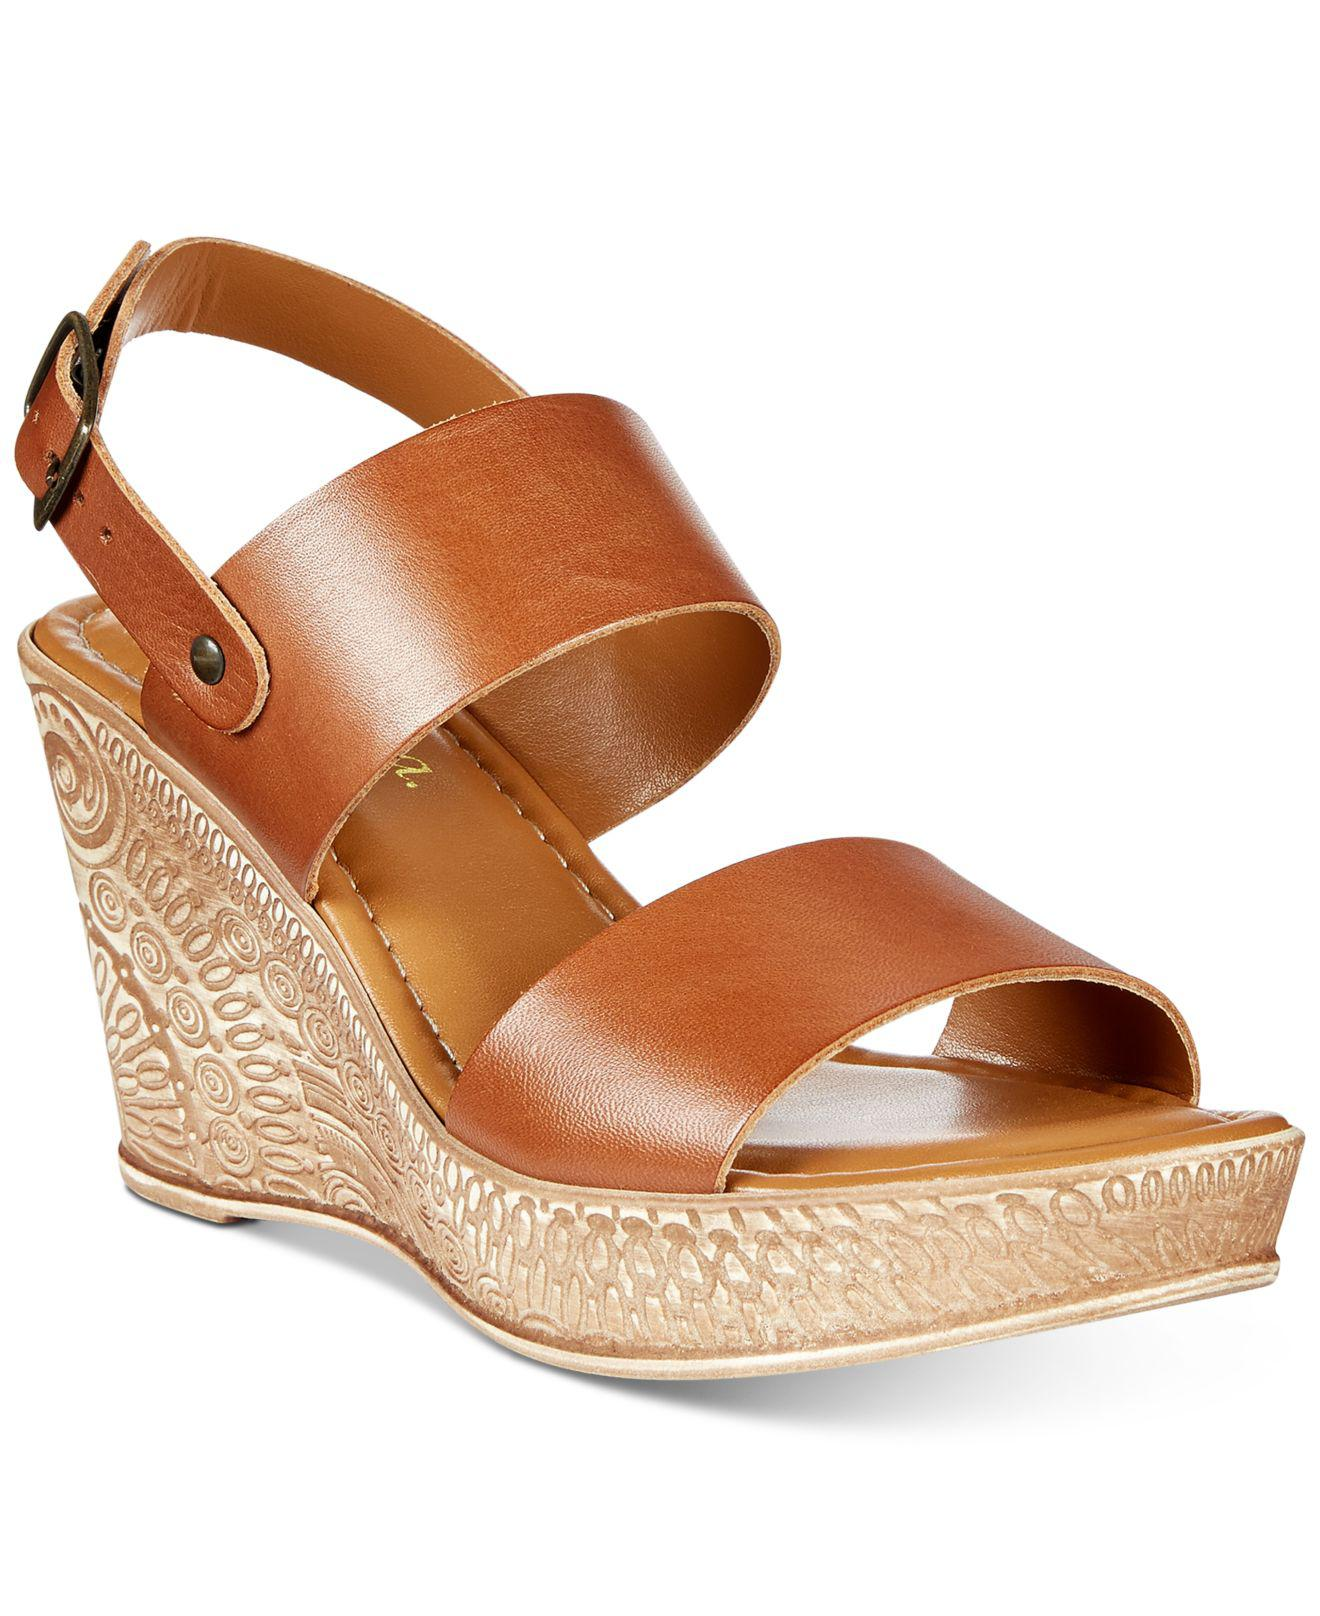 Bella Vita Women's Cor Wedge Sandal LVToTNw3b0